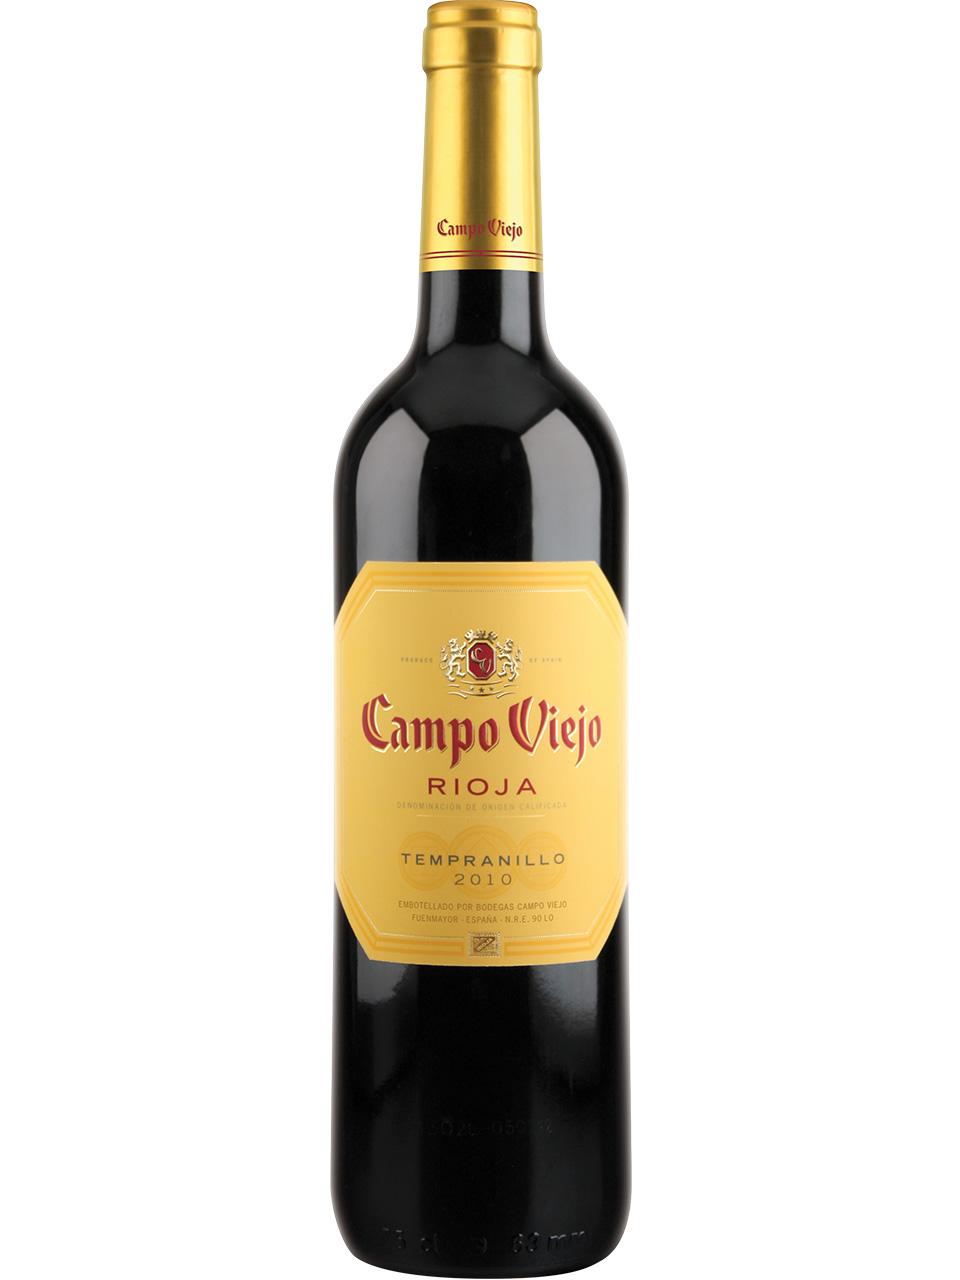 Campo Viejo Rioja Tempranillo